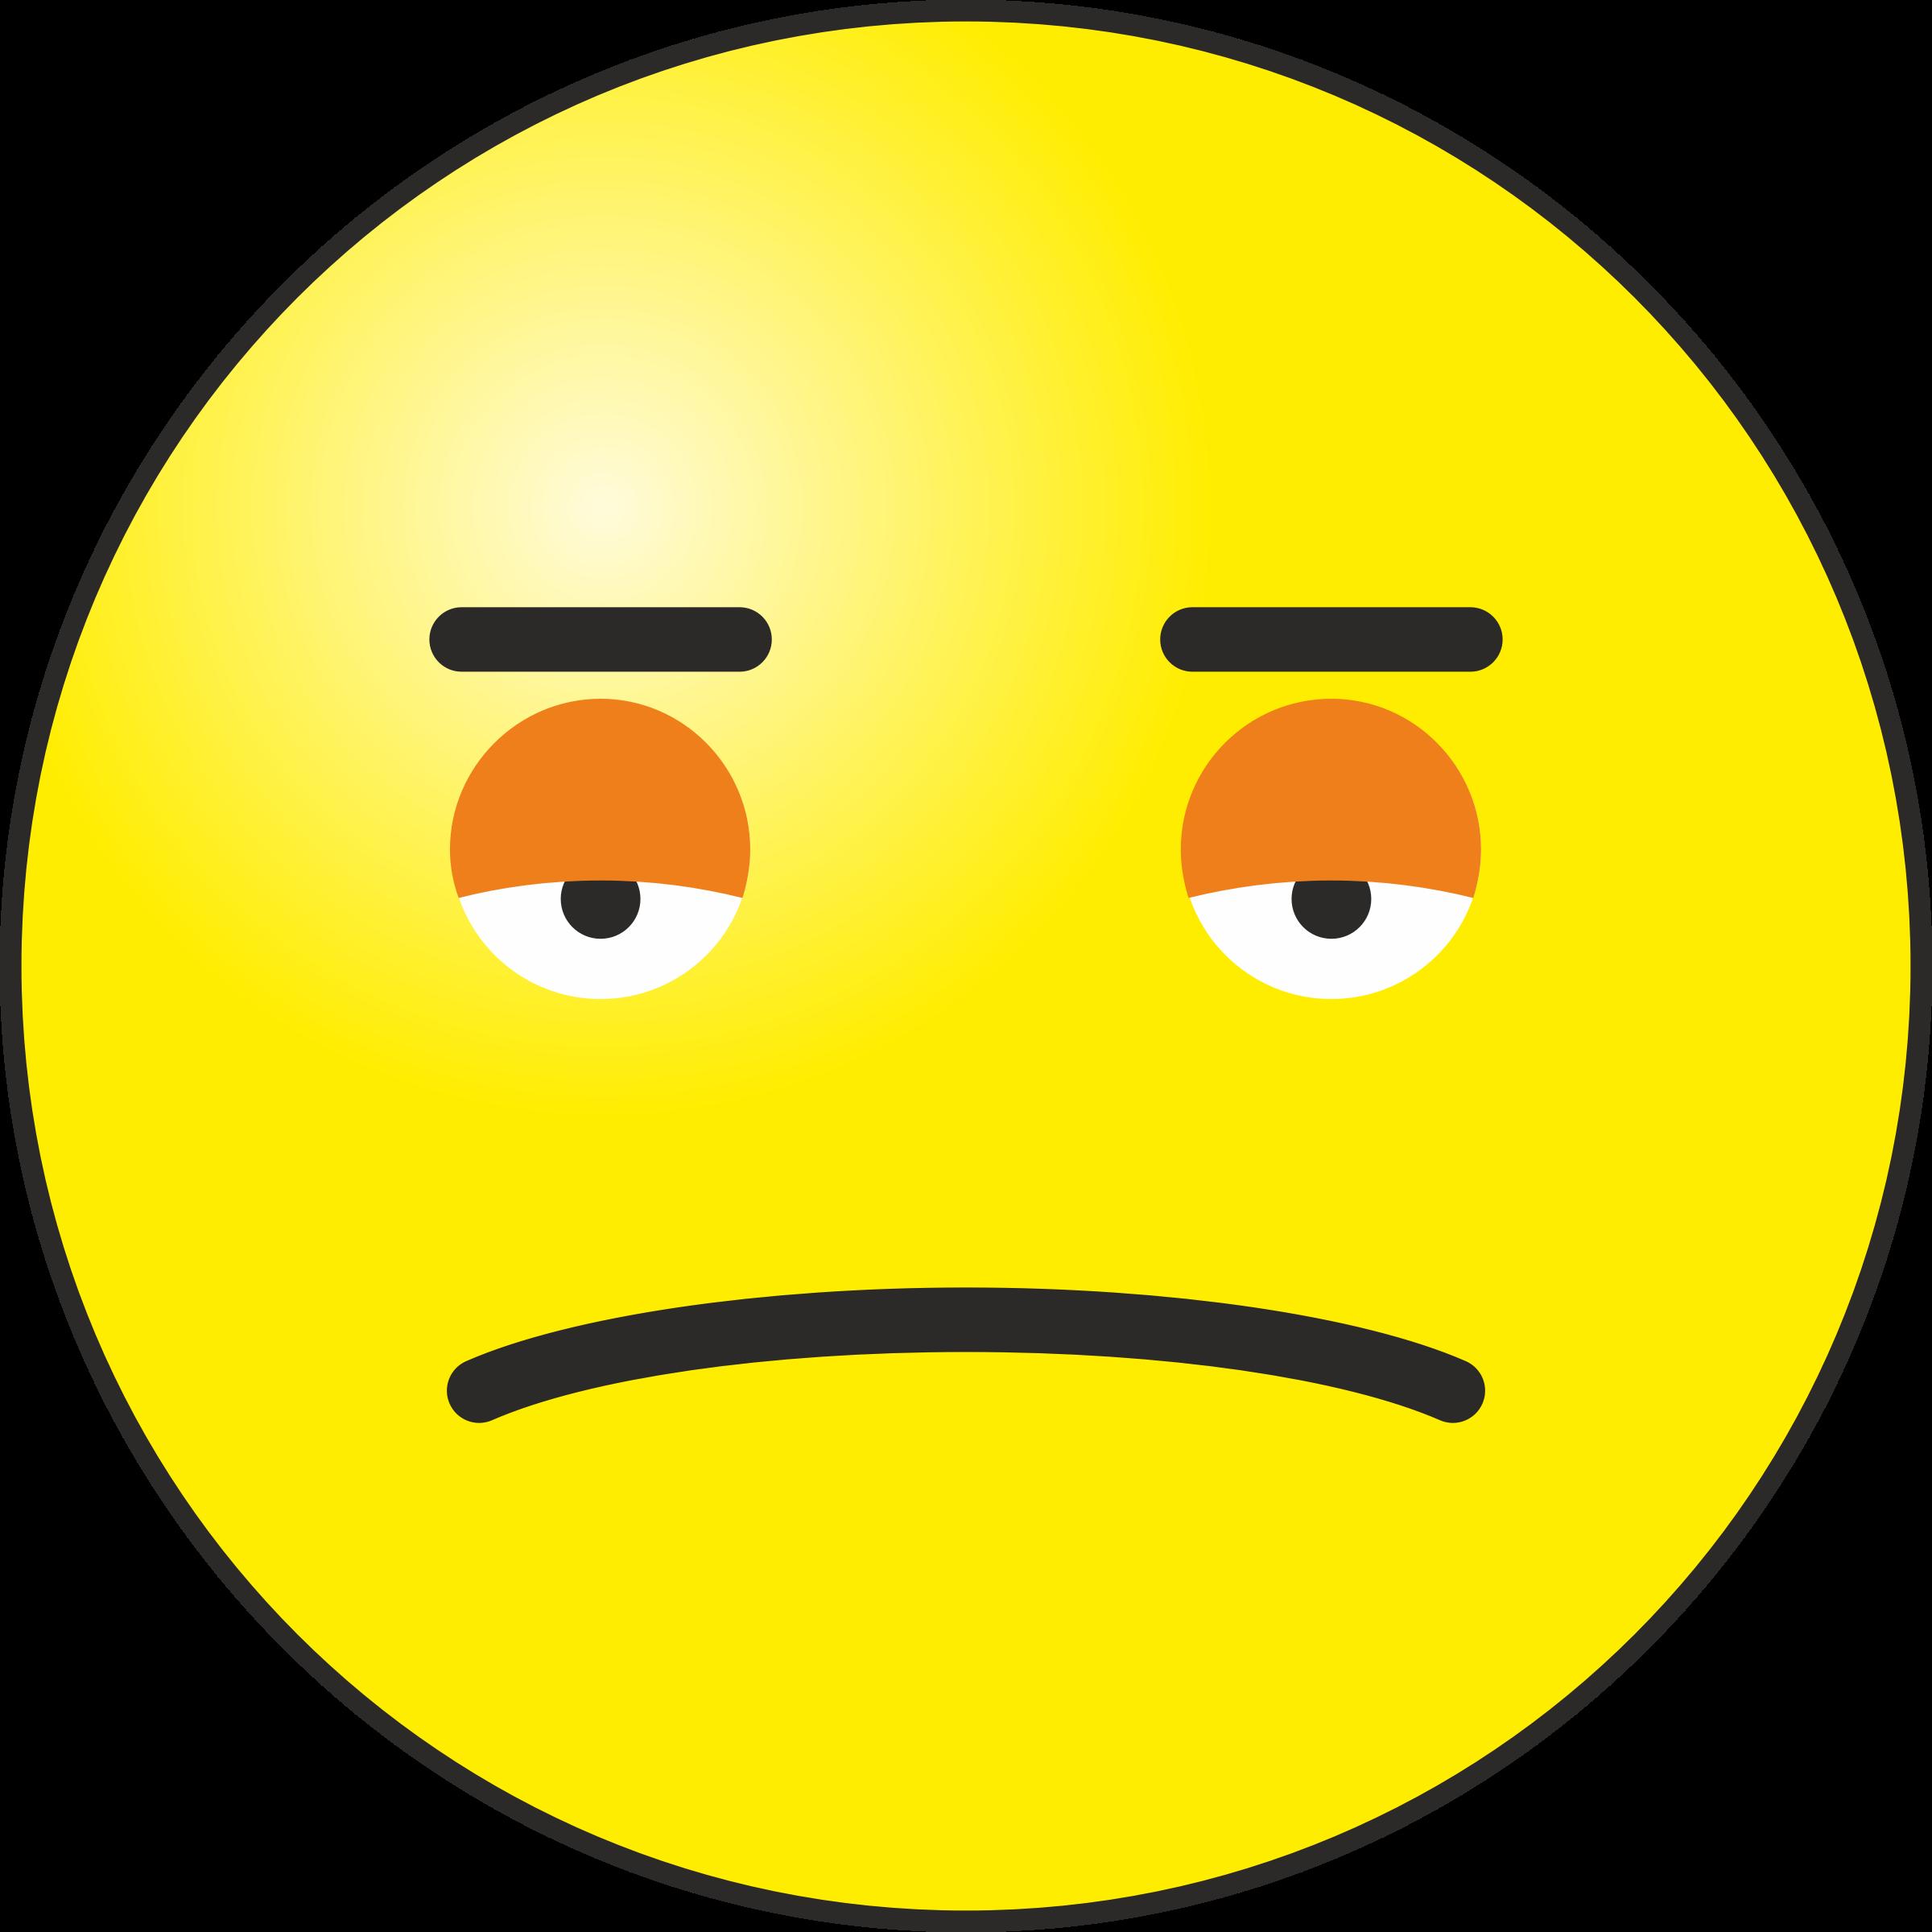 Big sad smiley group. Volleyball clipart emoji